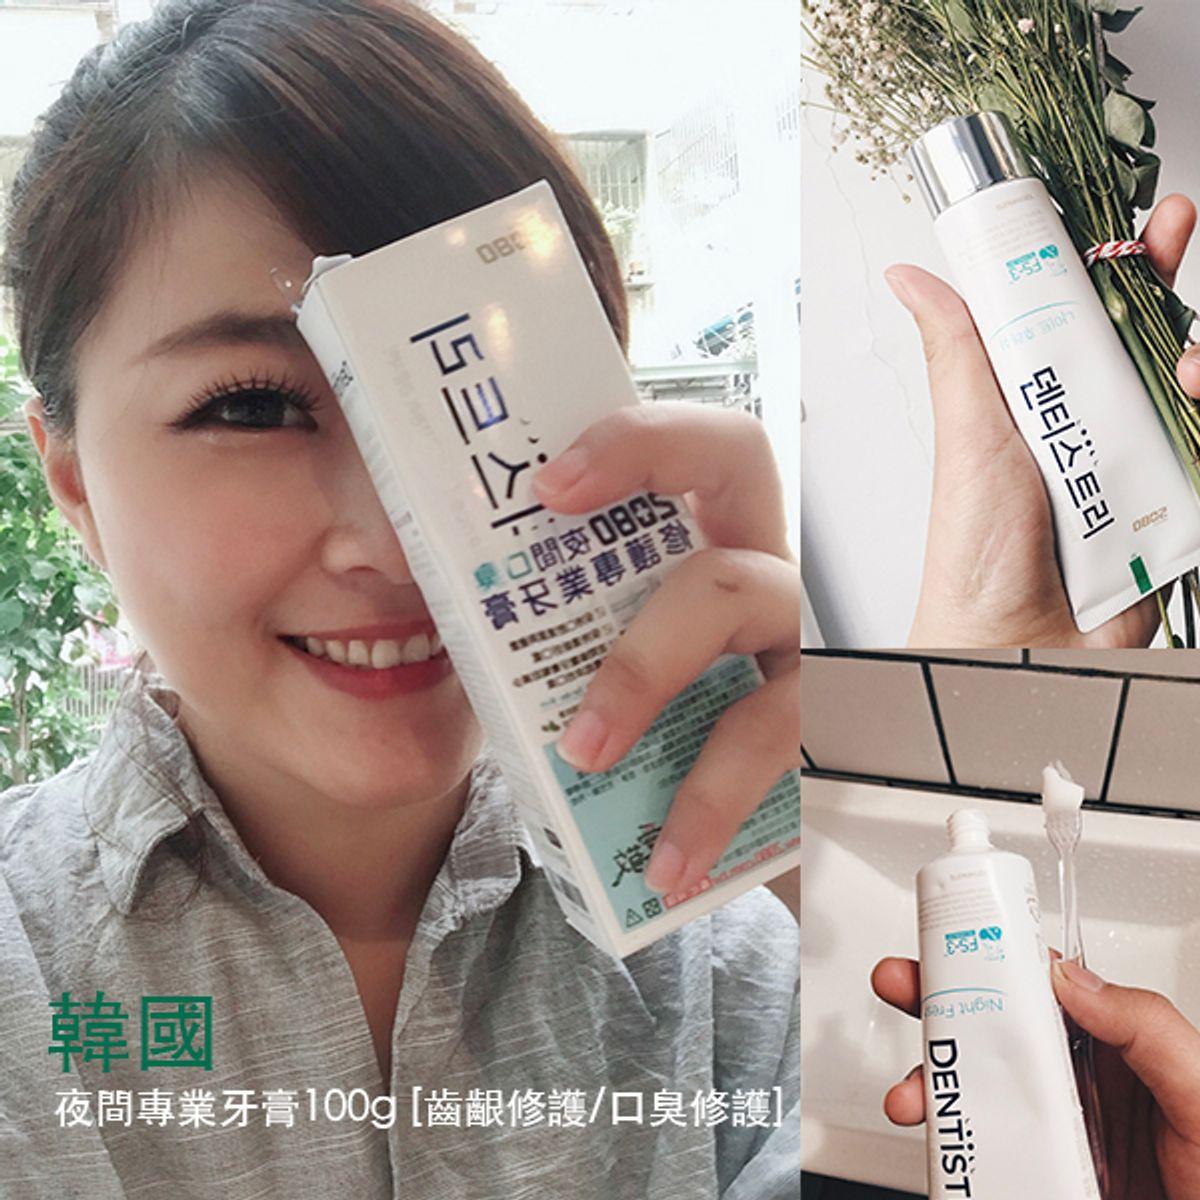 BOHO愛漂釀:夜間專業牙膏100g [齒齦修護/口臭修護]